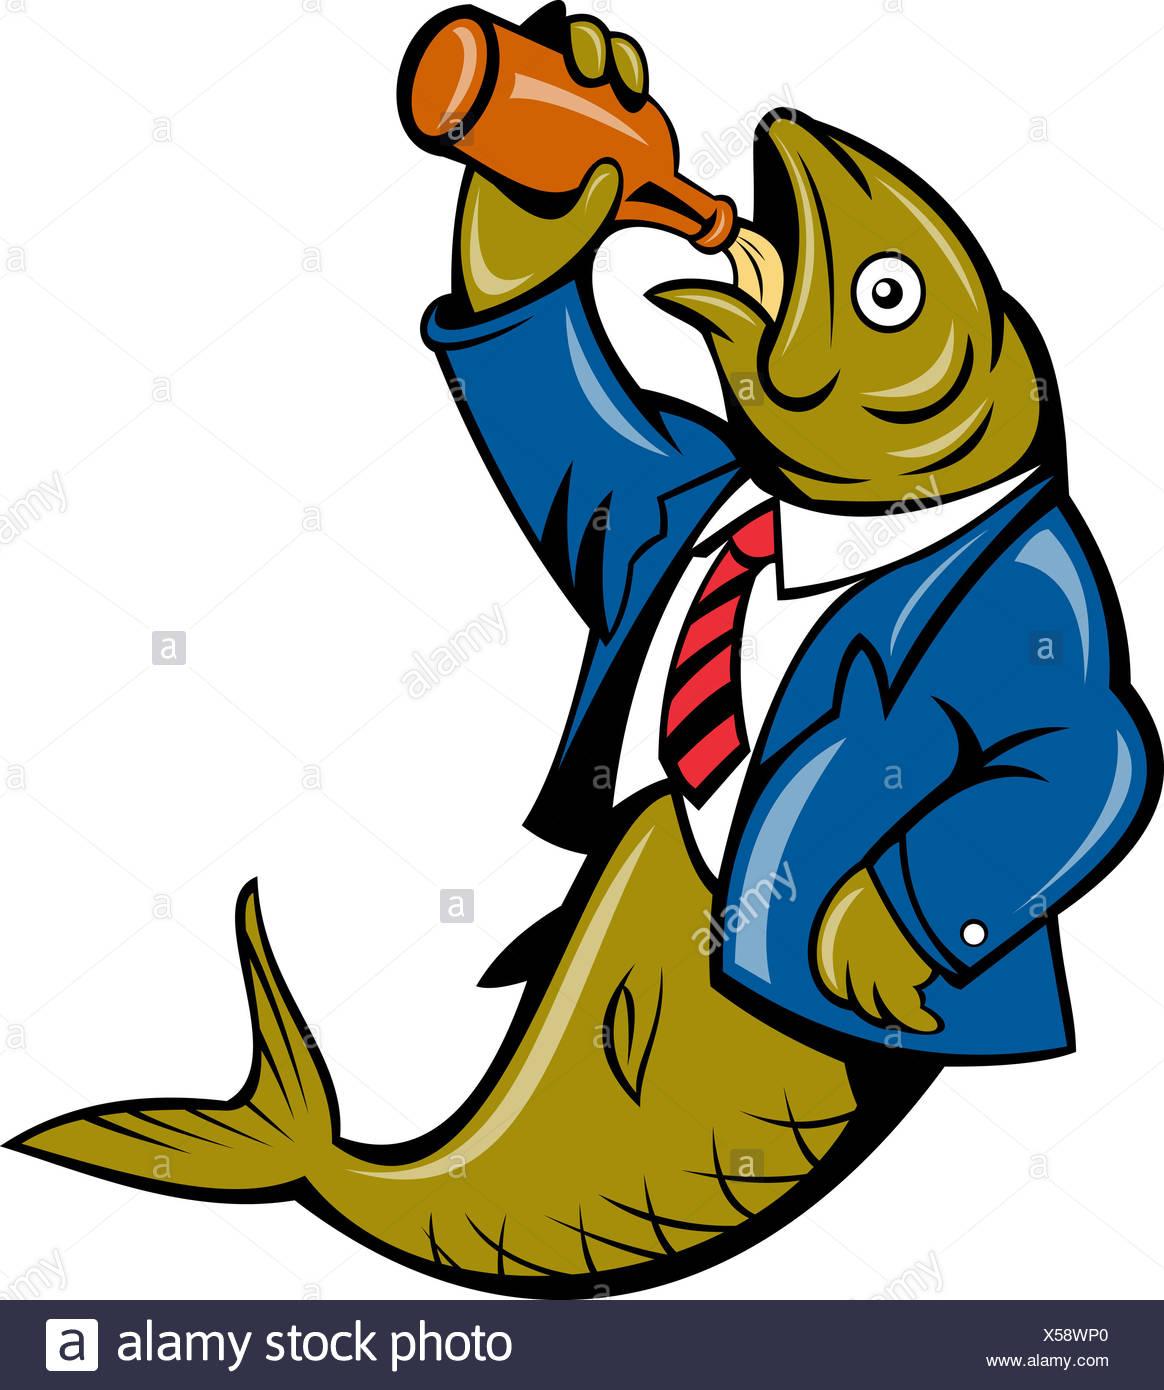 Herring fish business suit drinking beer bottle Stock Photo.